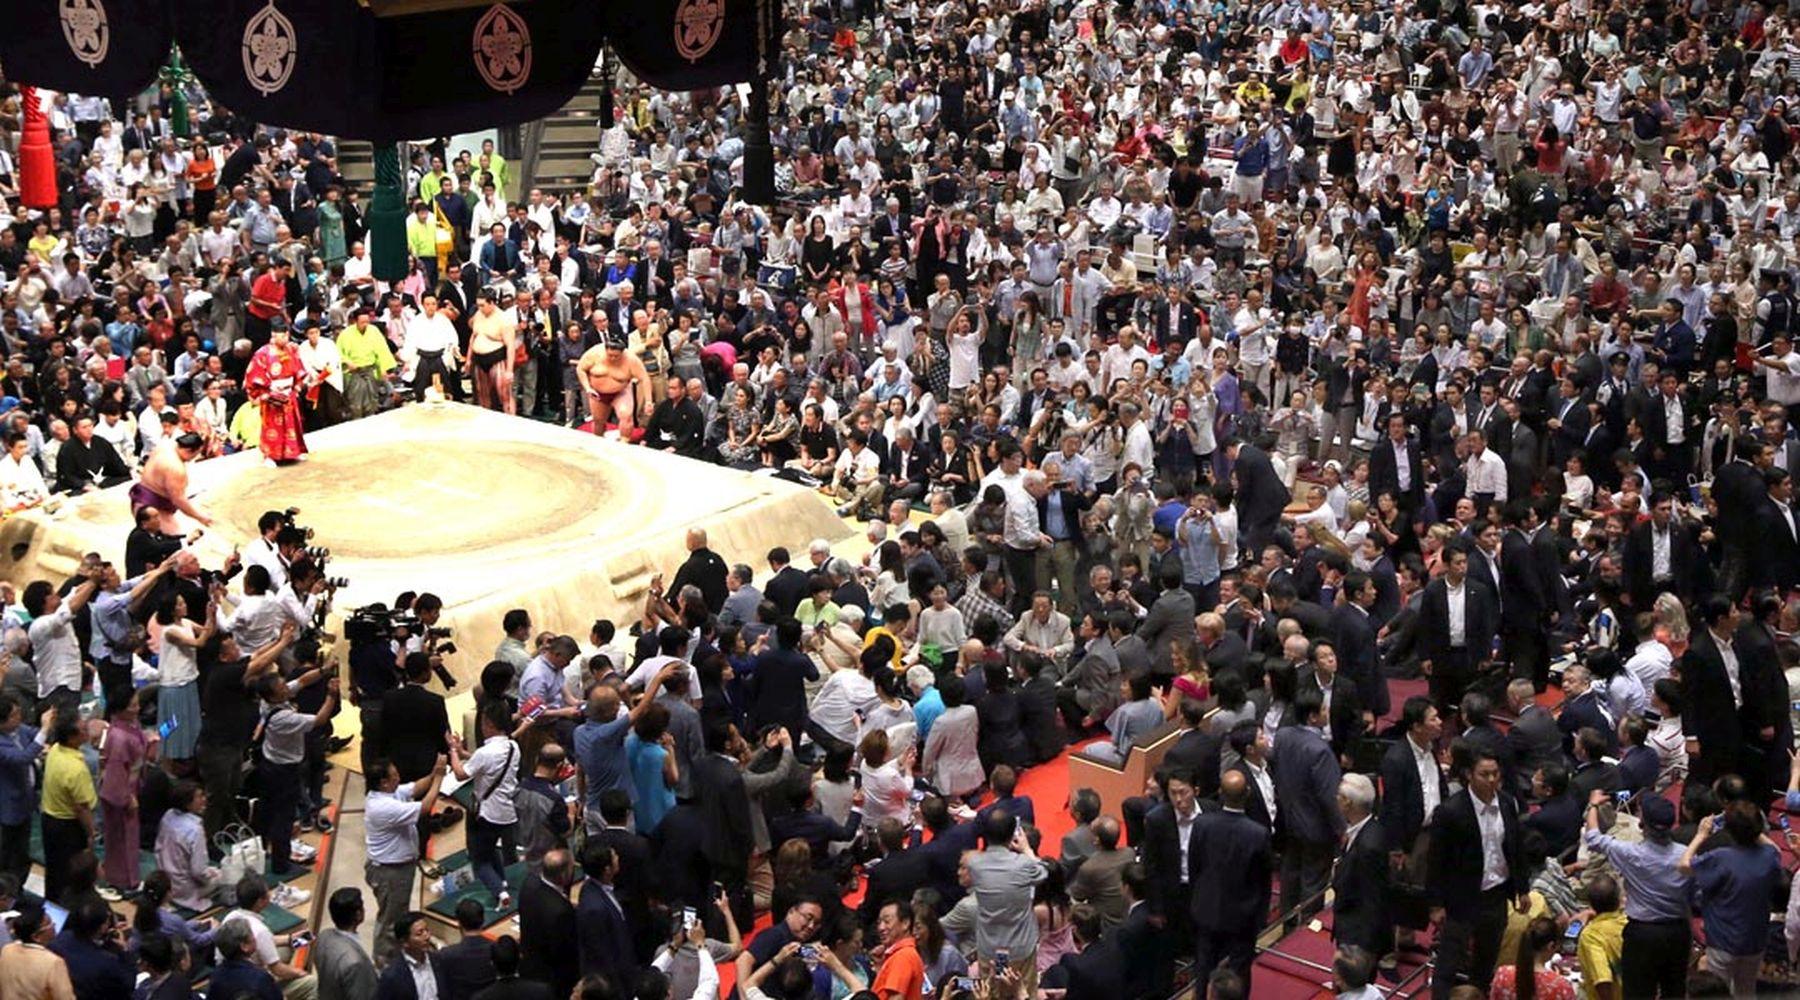 President Trump U.S. Cup to Japan Sumo Wrestler 002